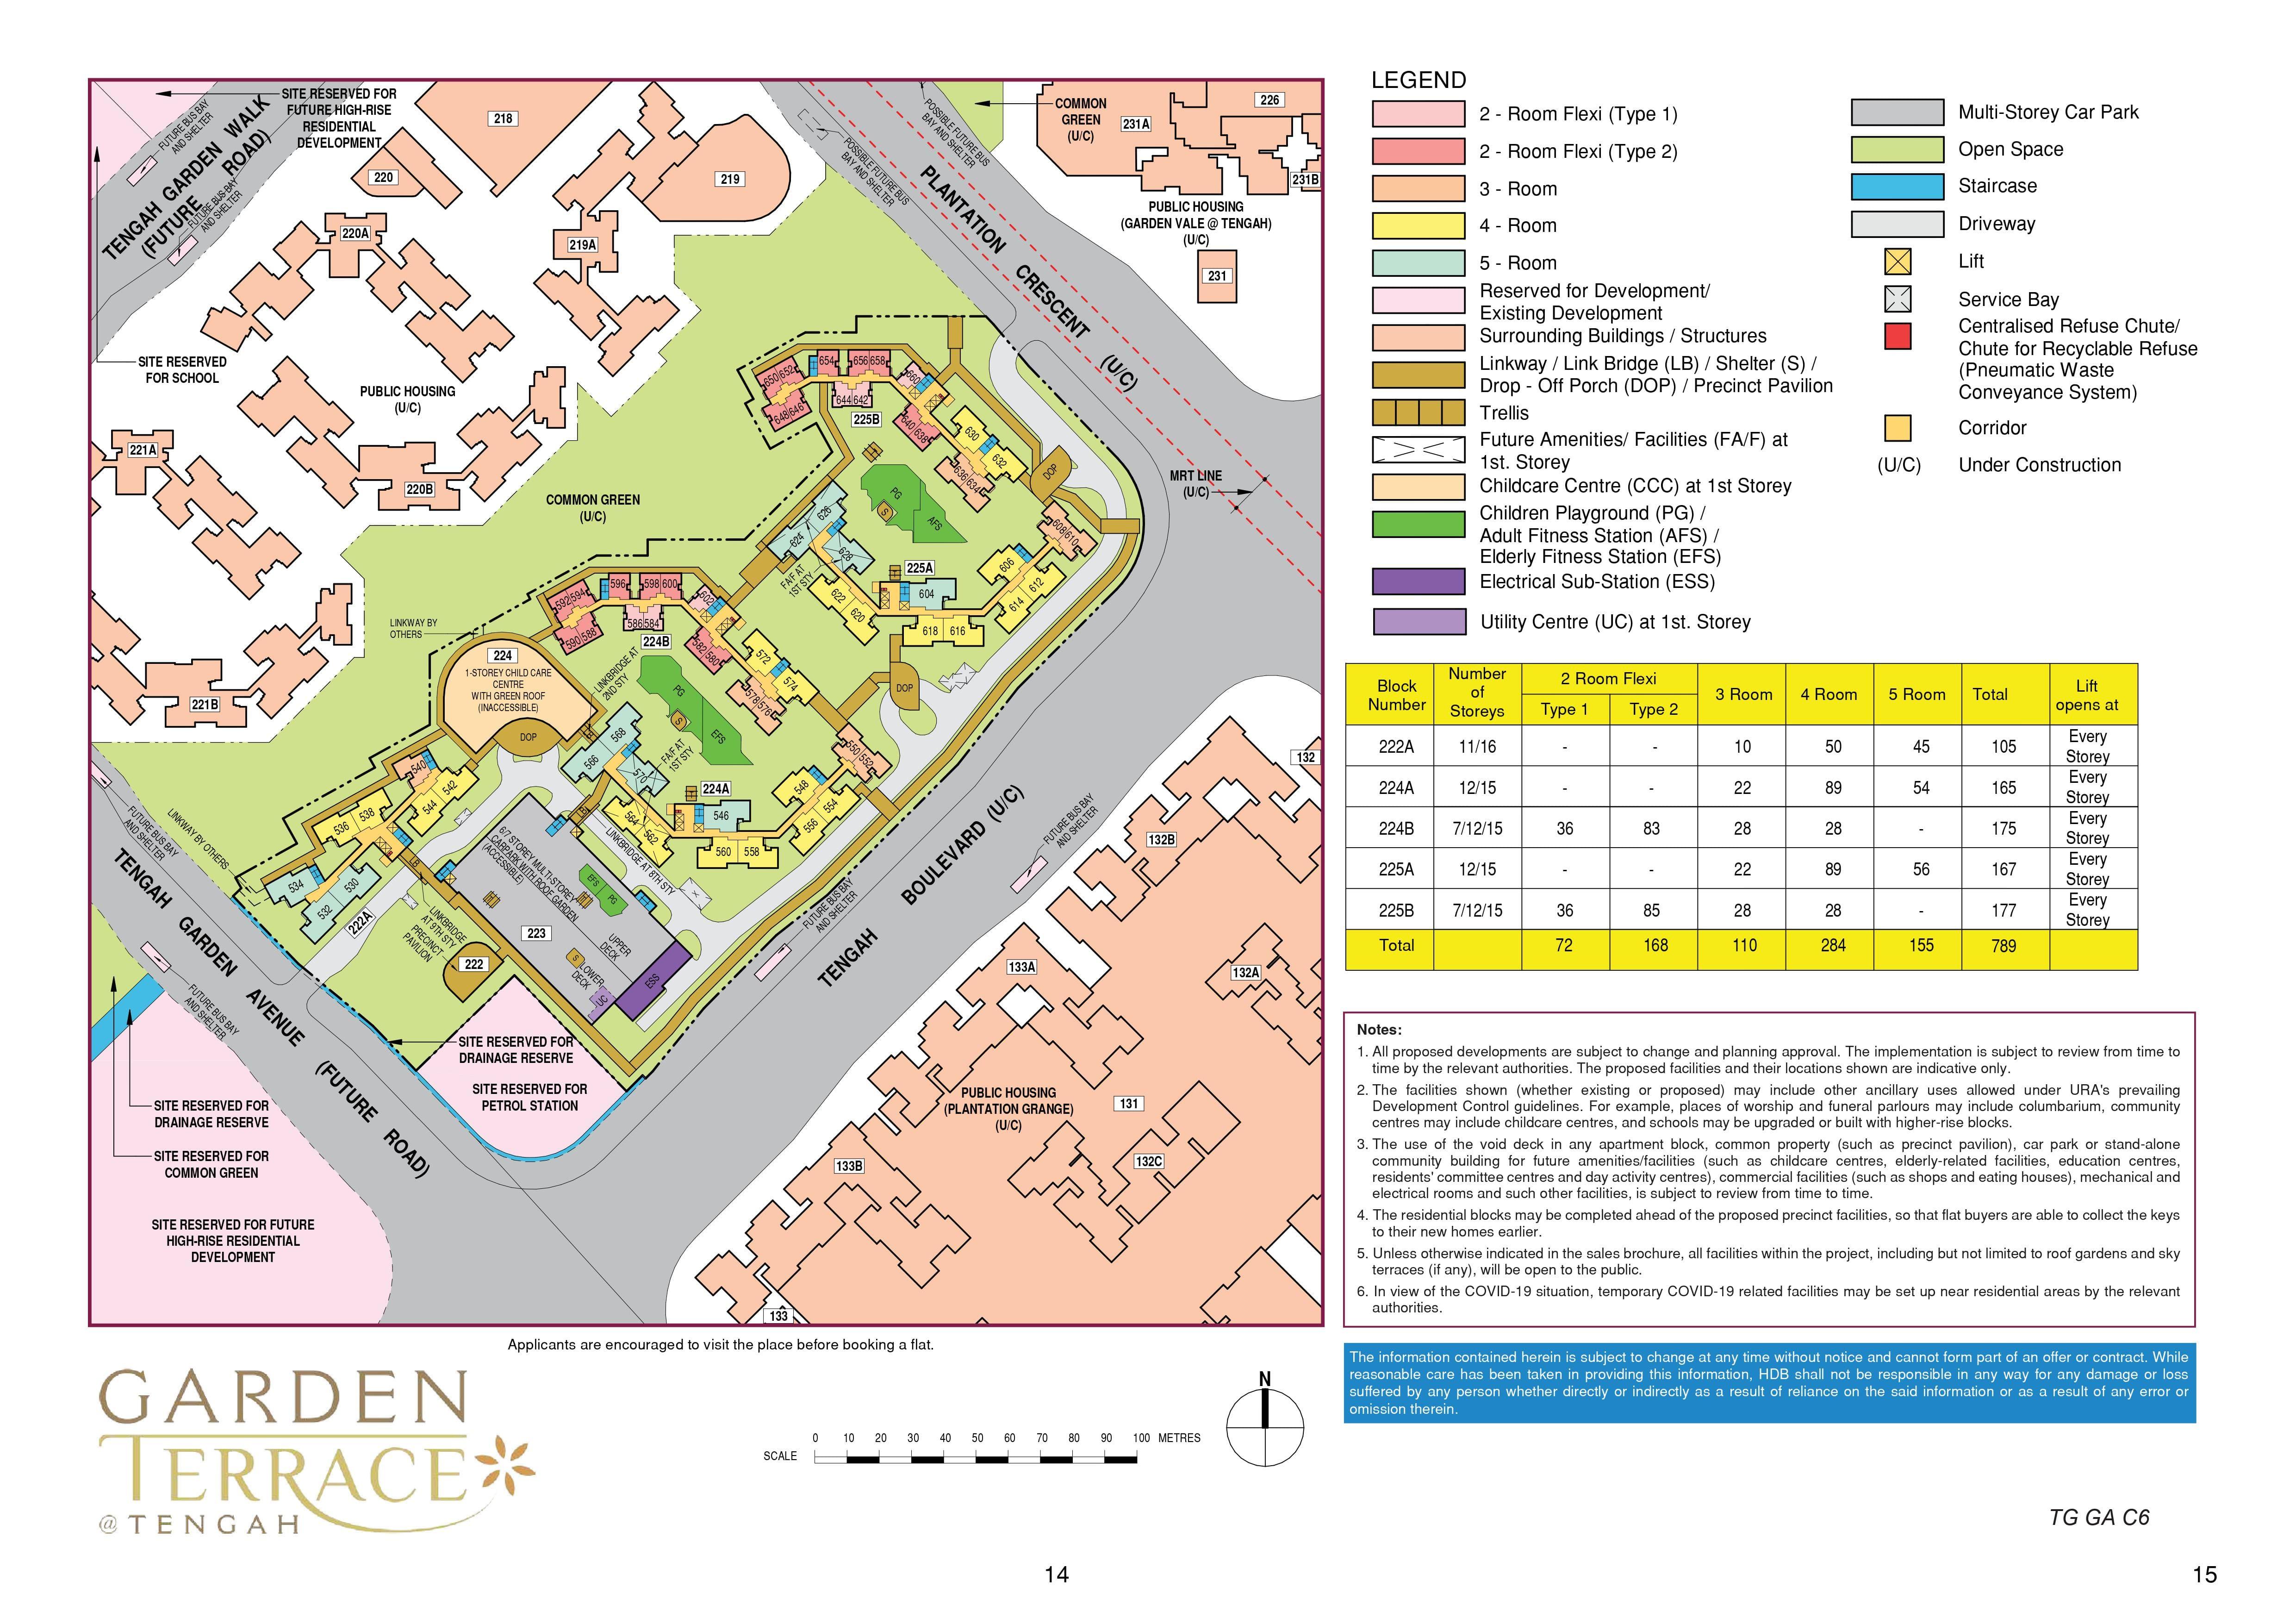 Garden Terrace @ Tengah Site Plan